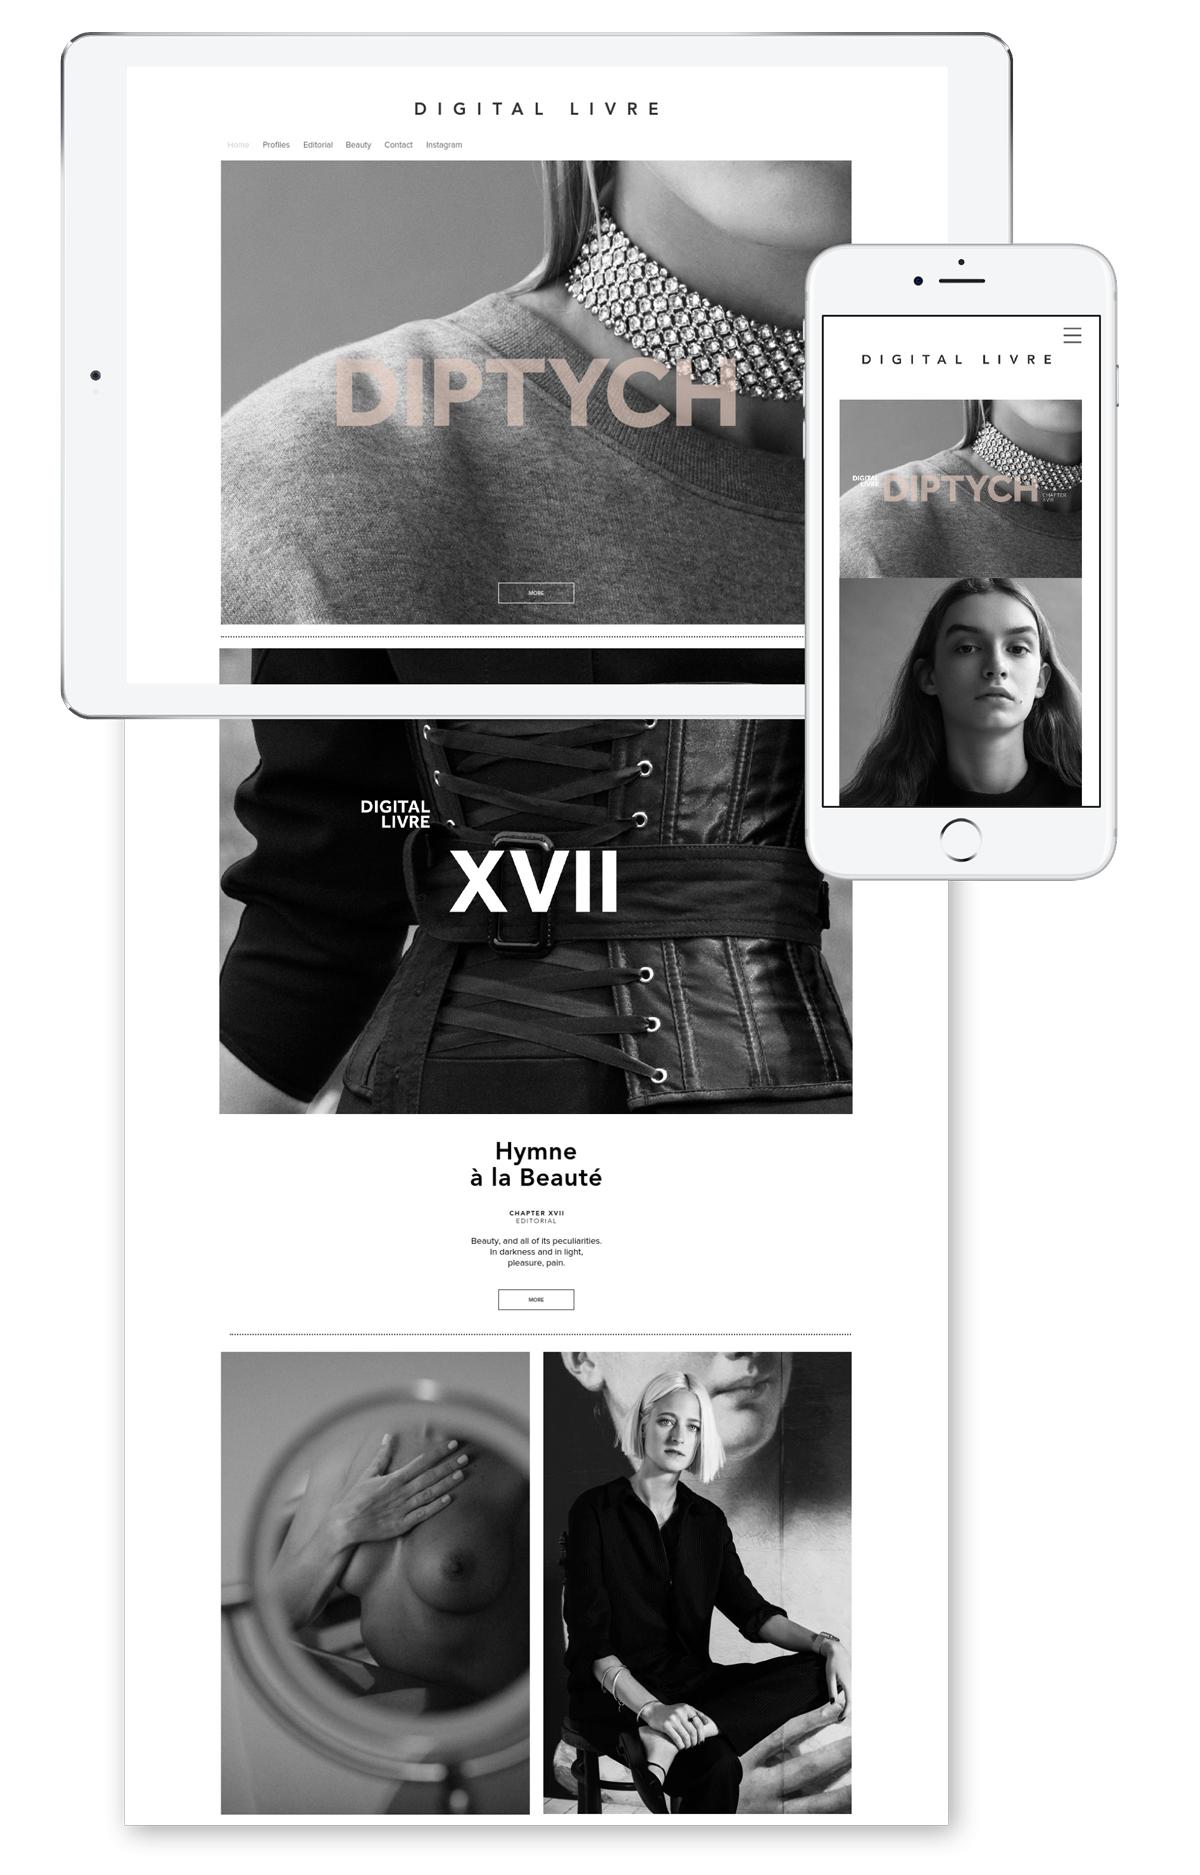 DigitalLivre_18_Diptych_018.png